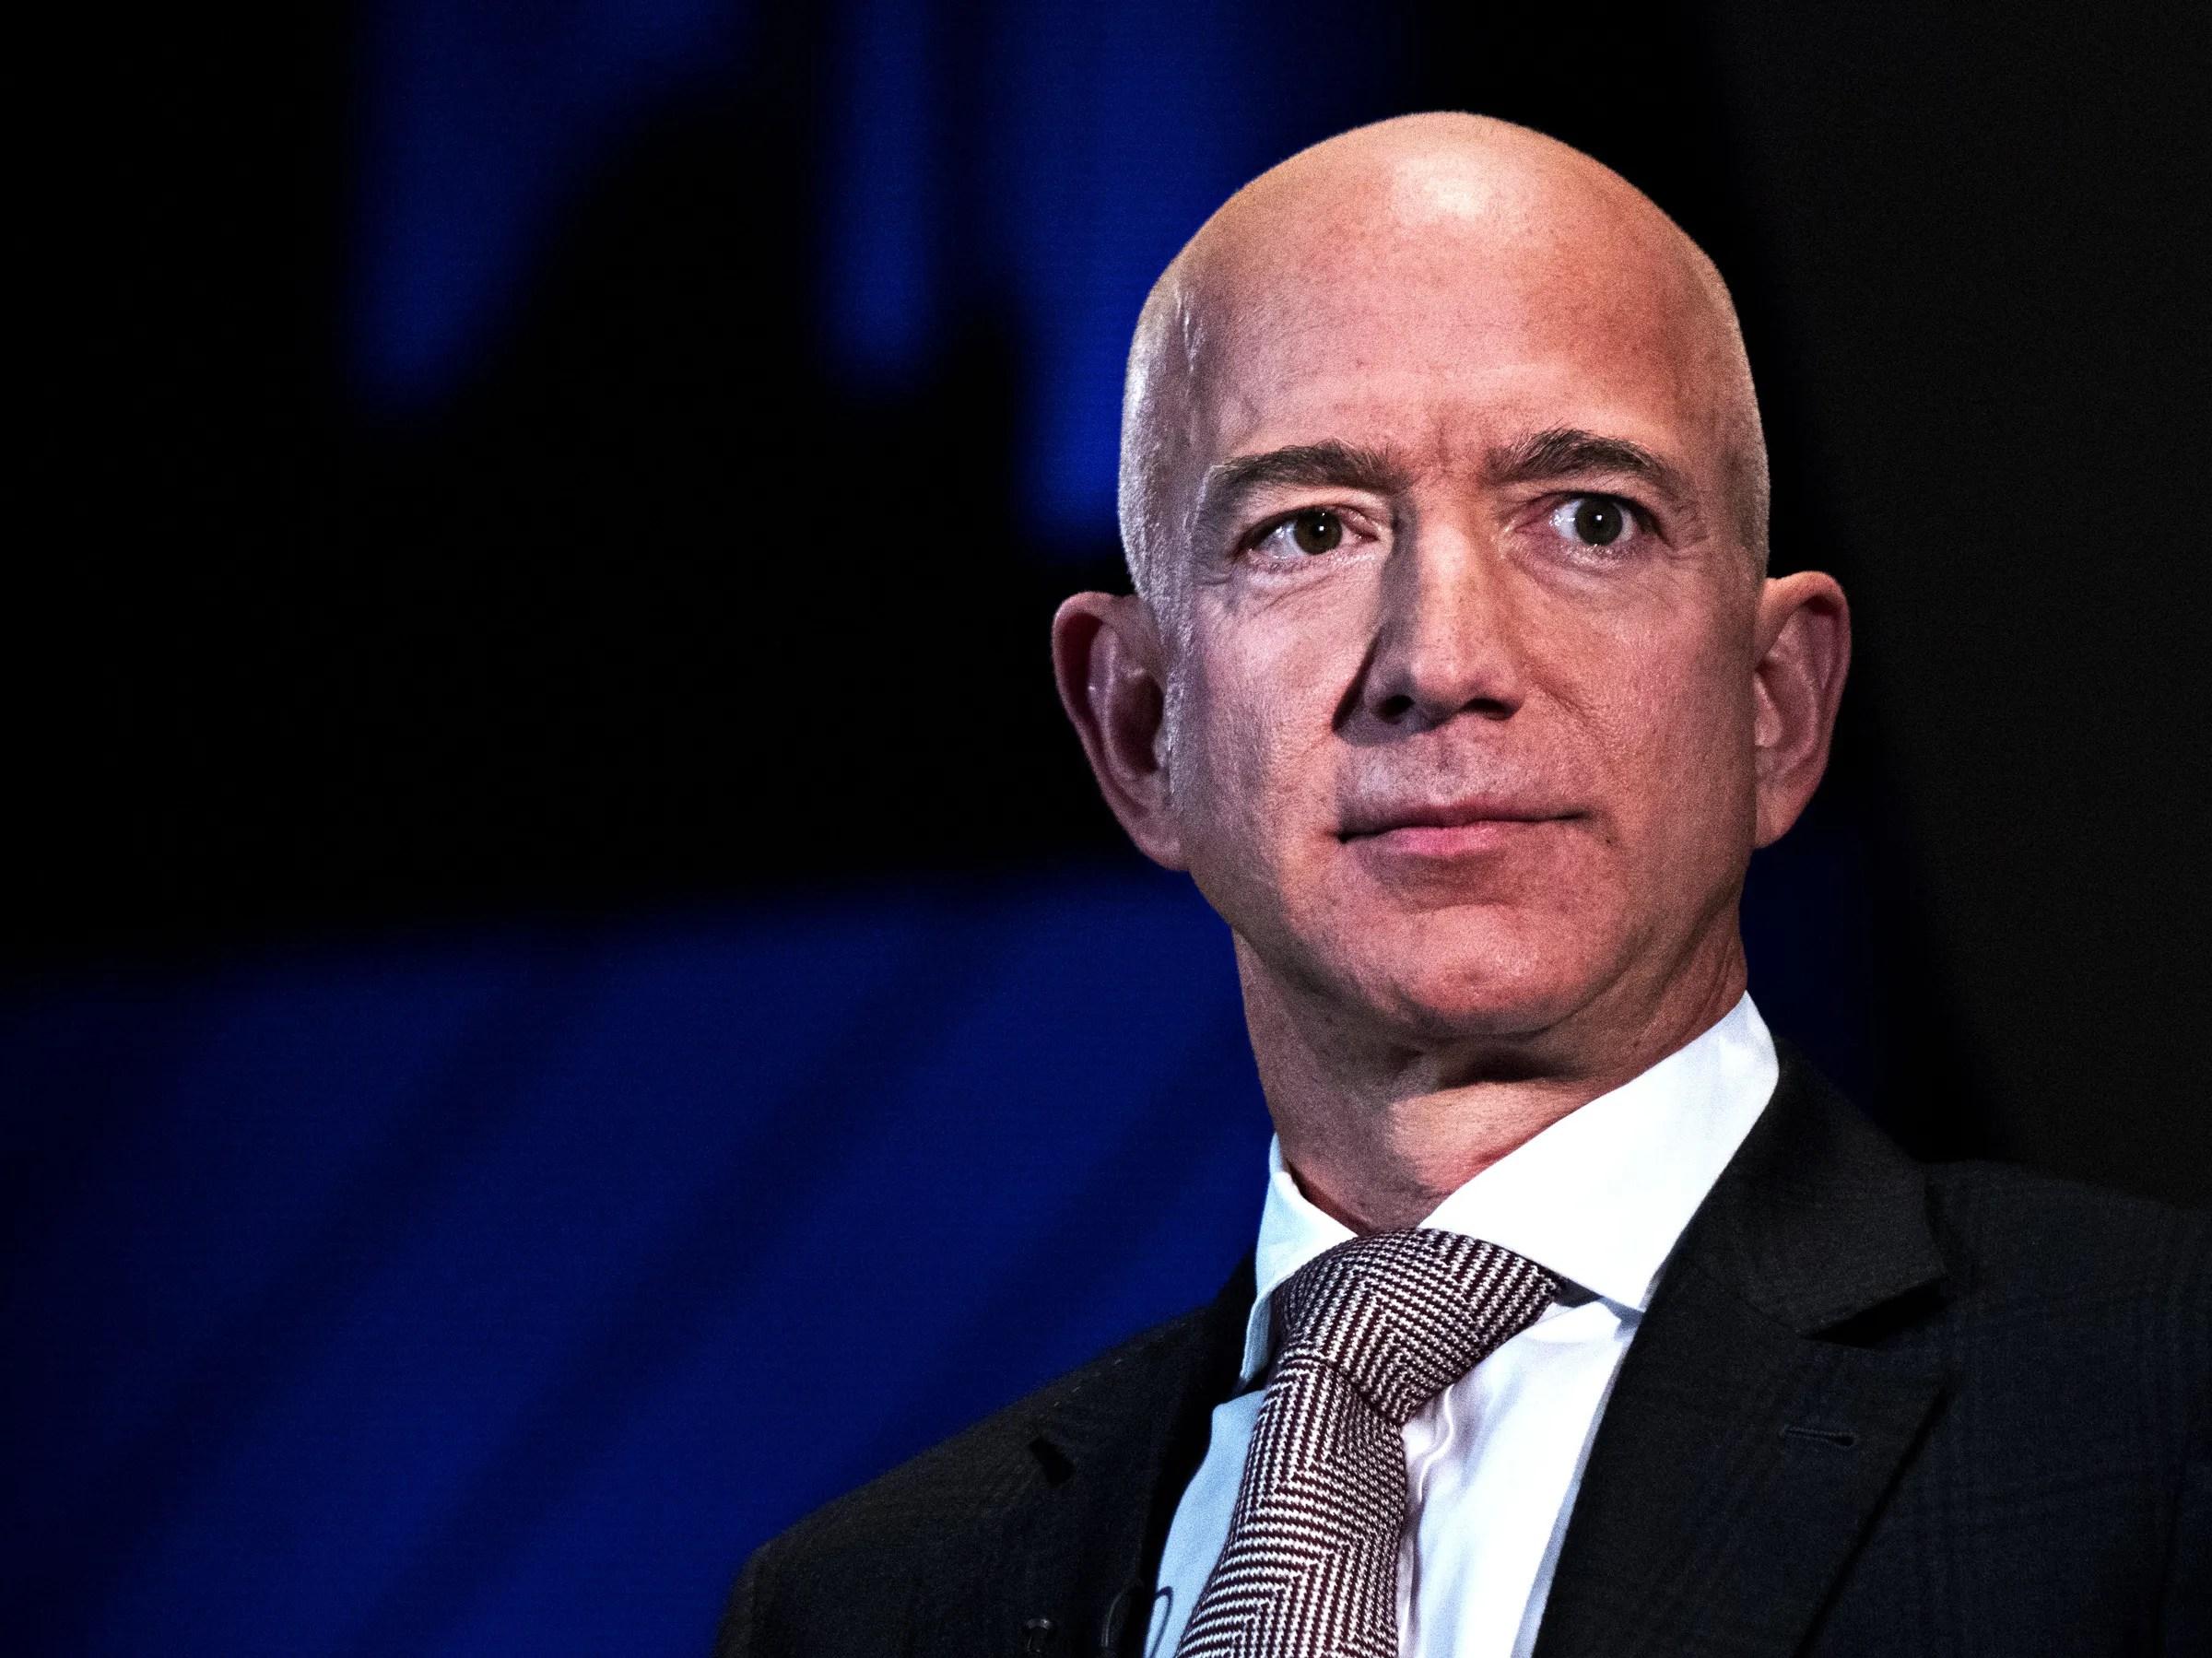 Jeff Bezos Divorce Could Mean Big Changes For Amazon